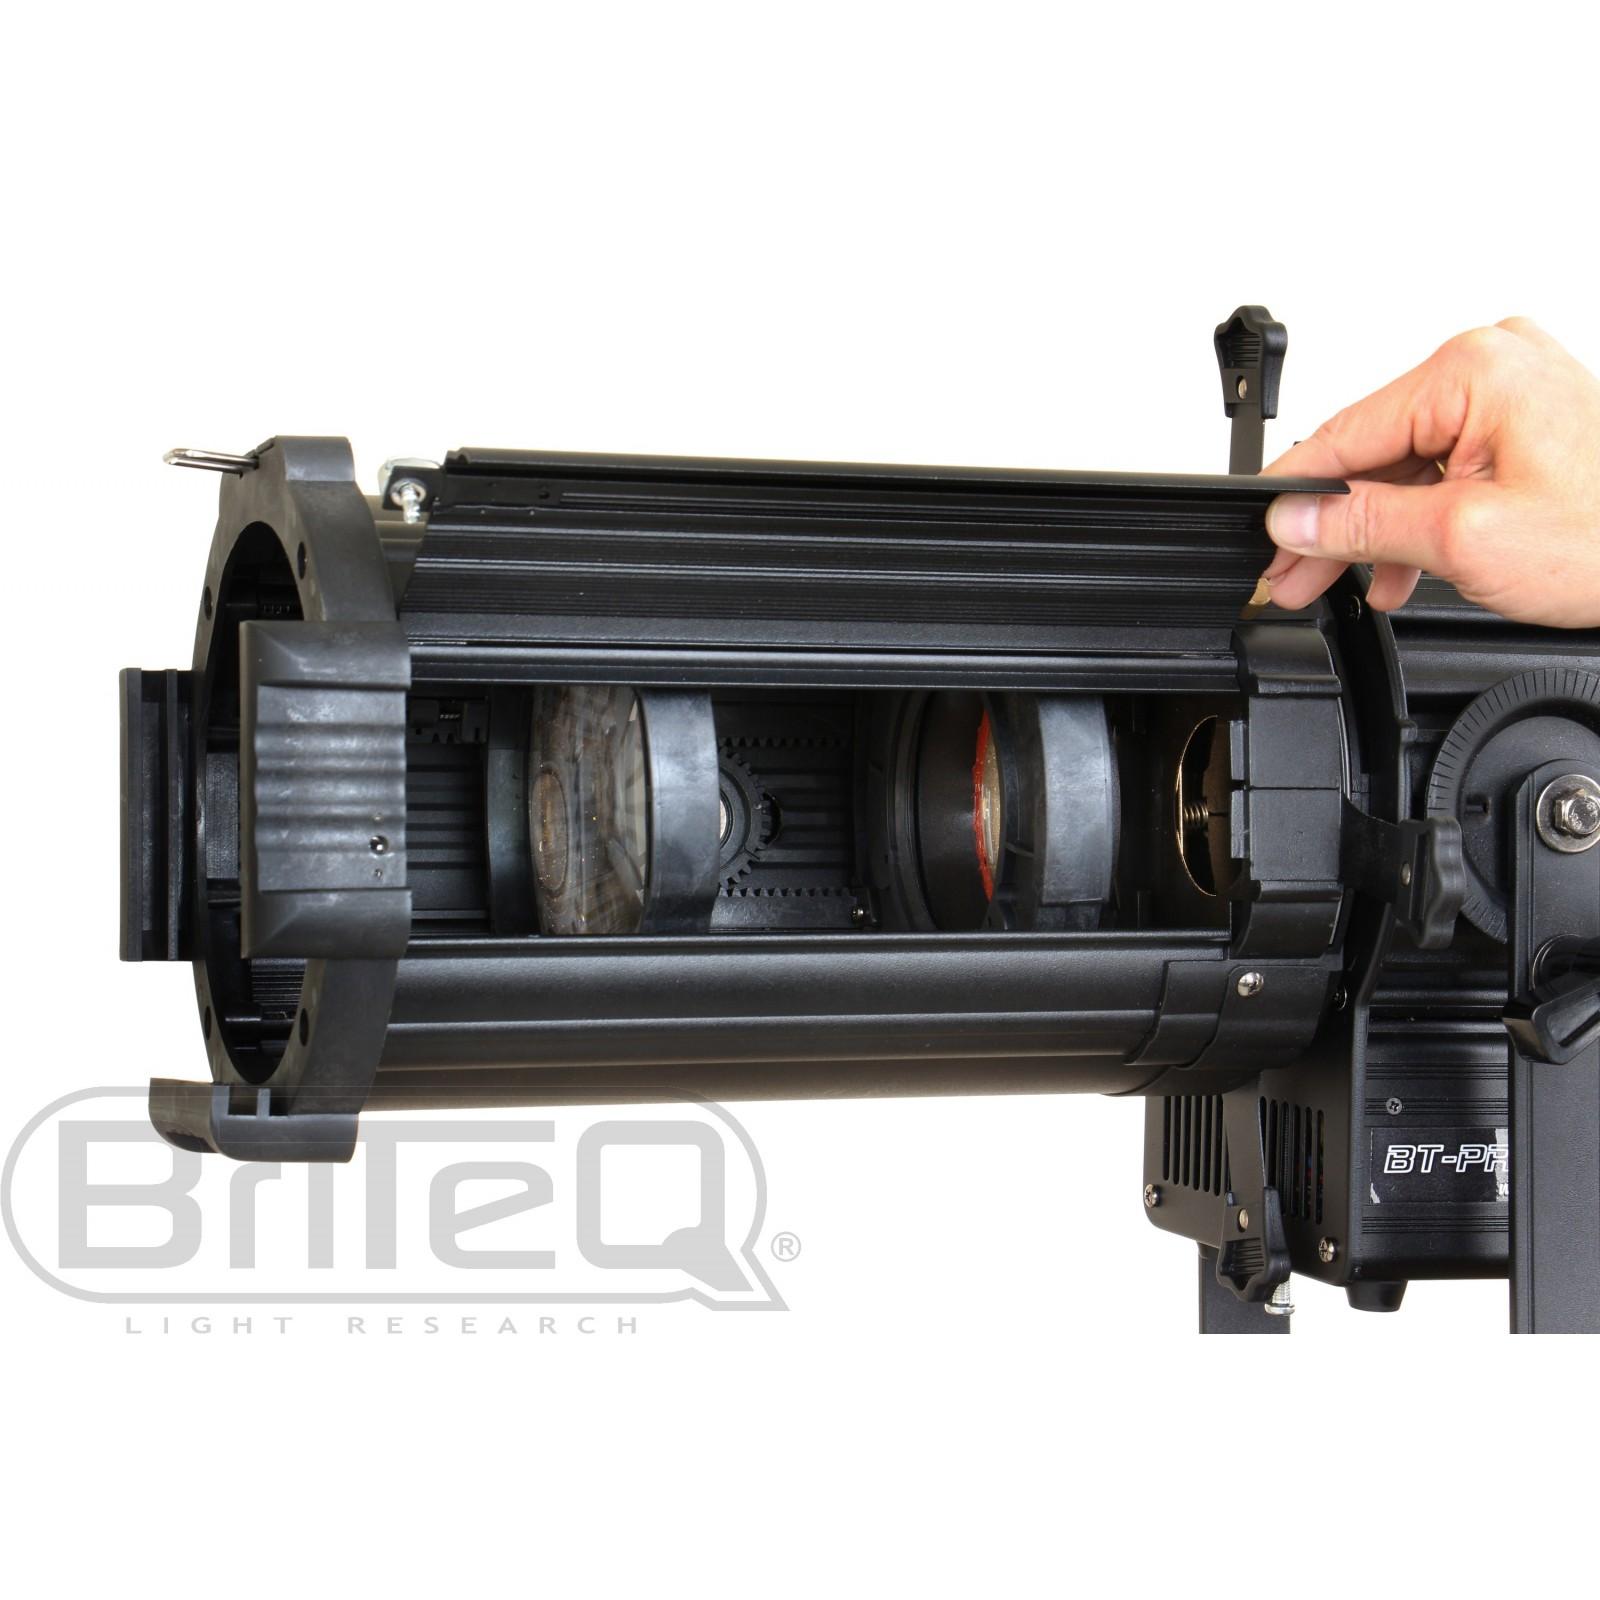 Briteq Bt Profile160 Optic 15 30 Theater Stage Lighting